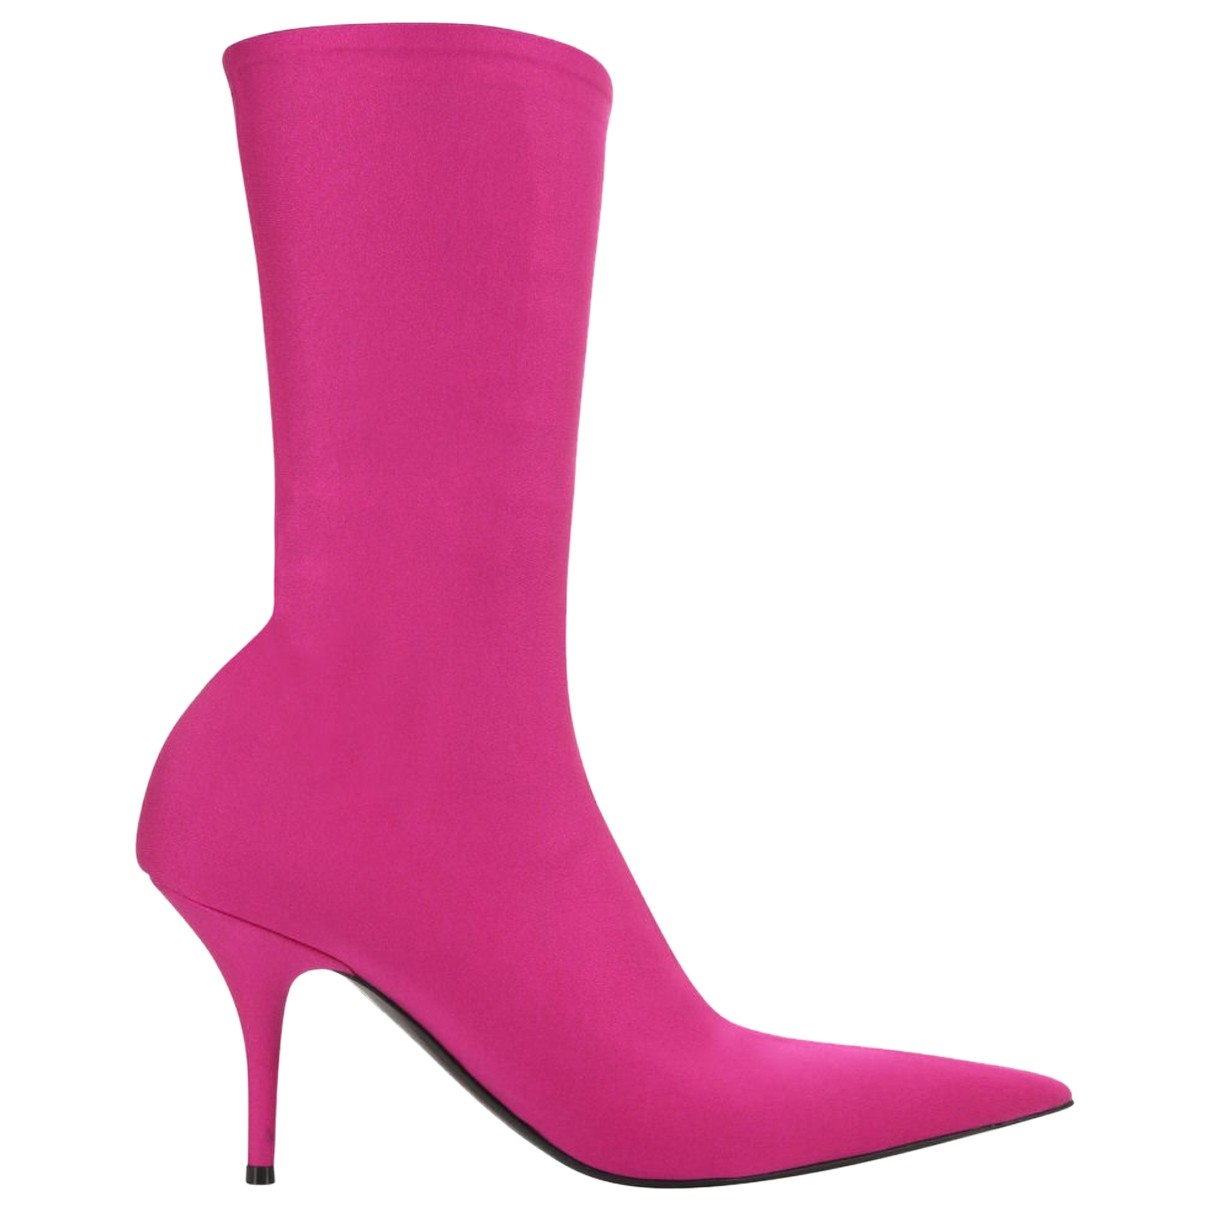 Balenciaga Knife Stiefel in  Rosa Polyester